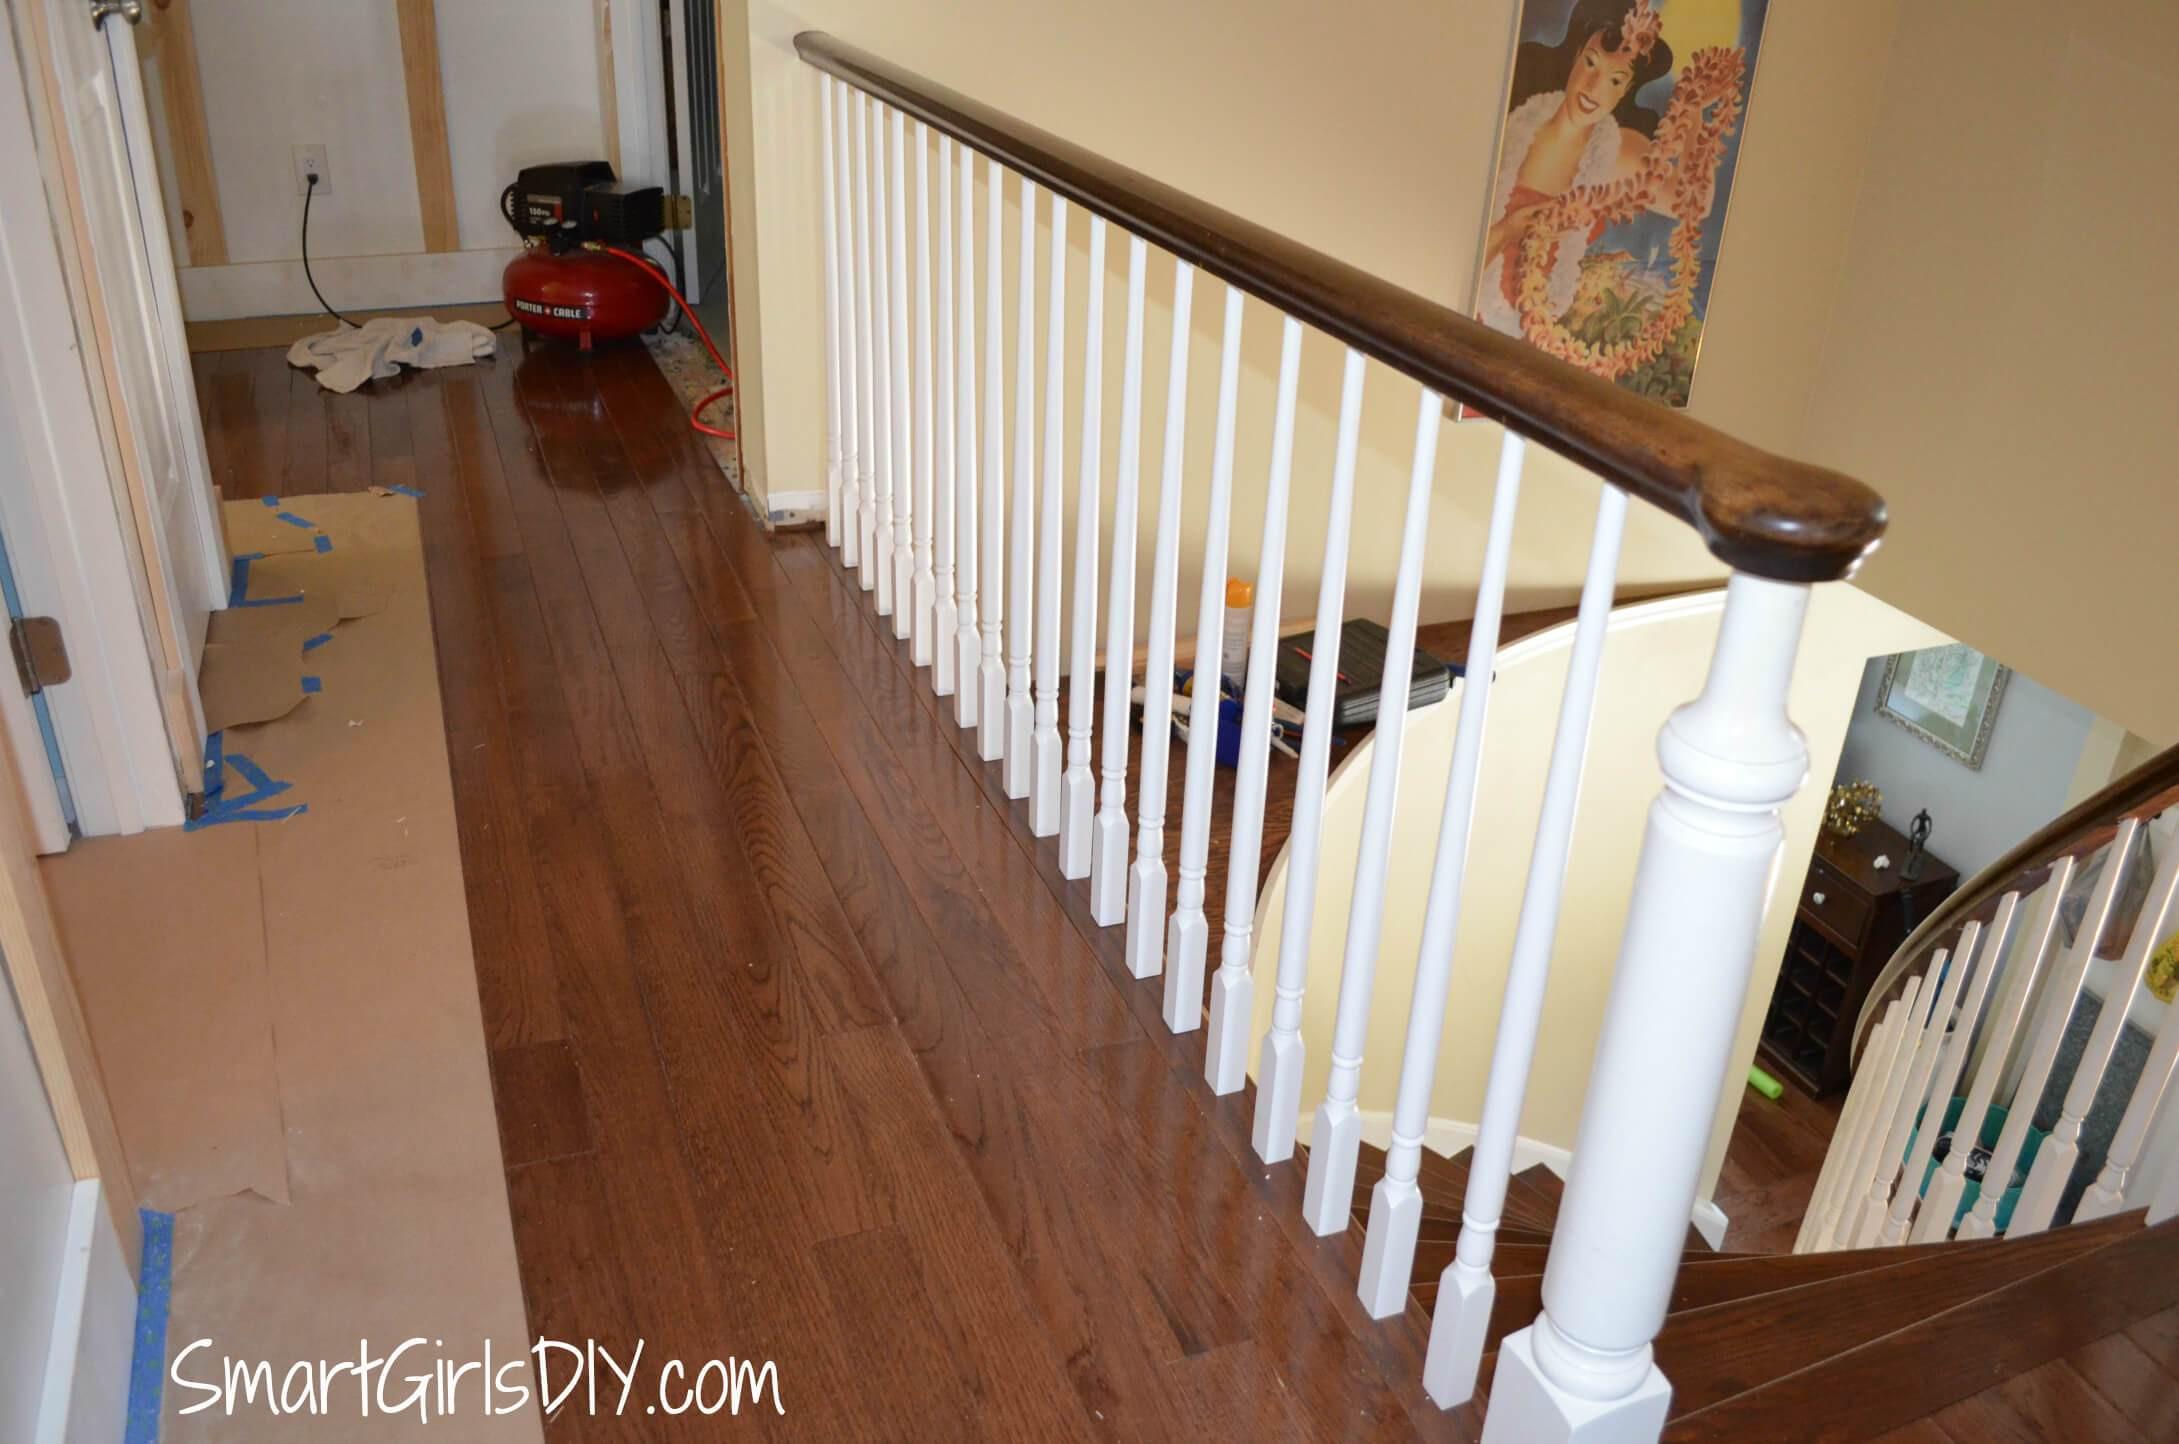 diy hardwood floor installation video of upstairs hallway 1 installing hardwood floors for upstairs hallway 2 hardwood spindles